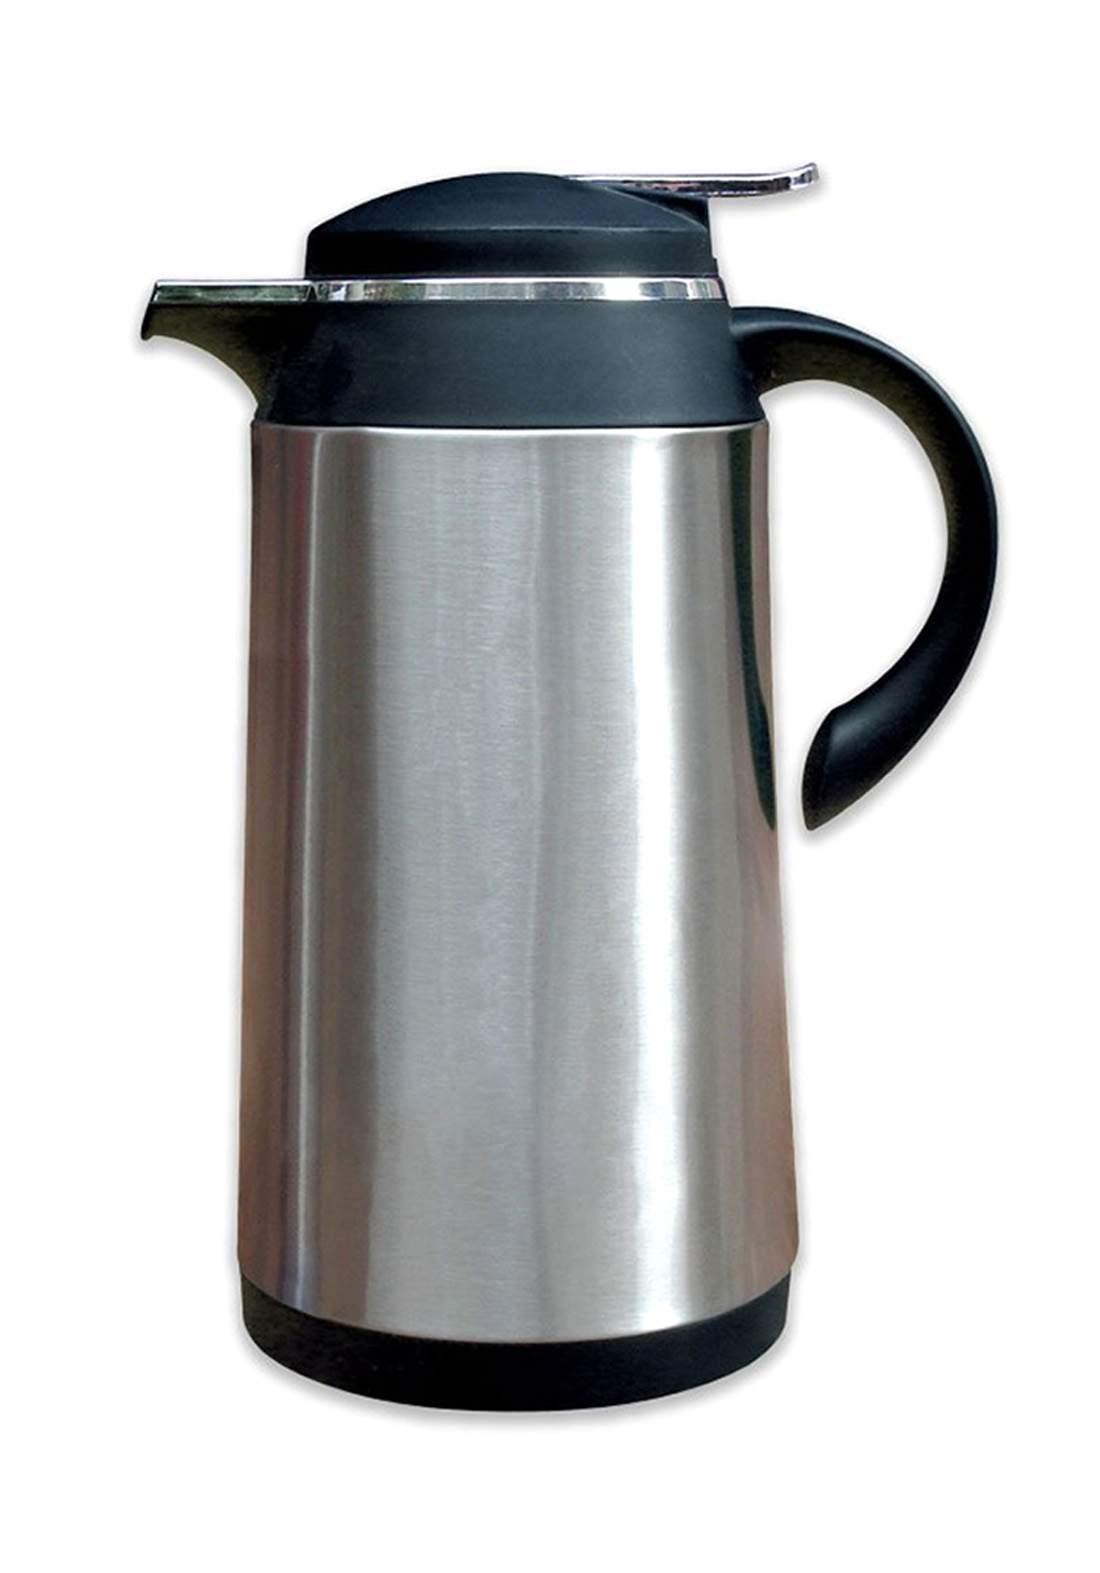 Delmonti DL 1440 Flask   Vacuun 1.5L  ترمز حراري